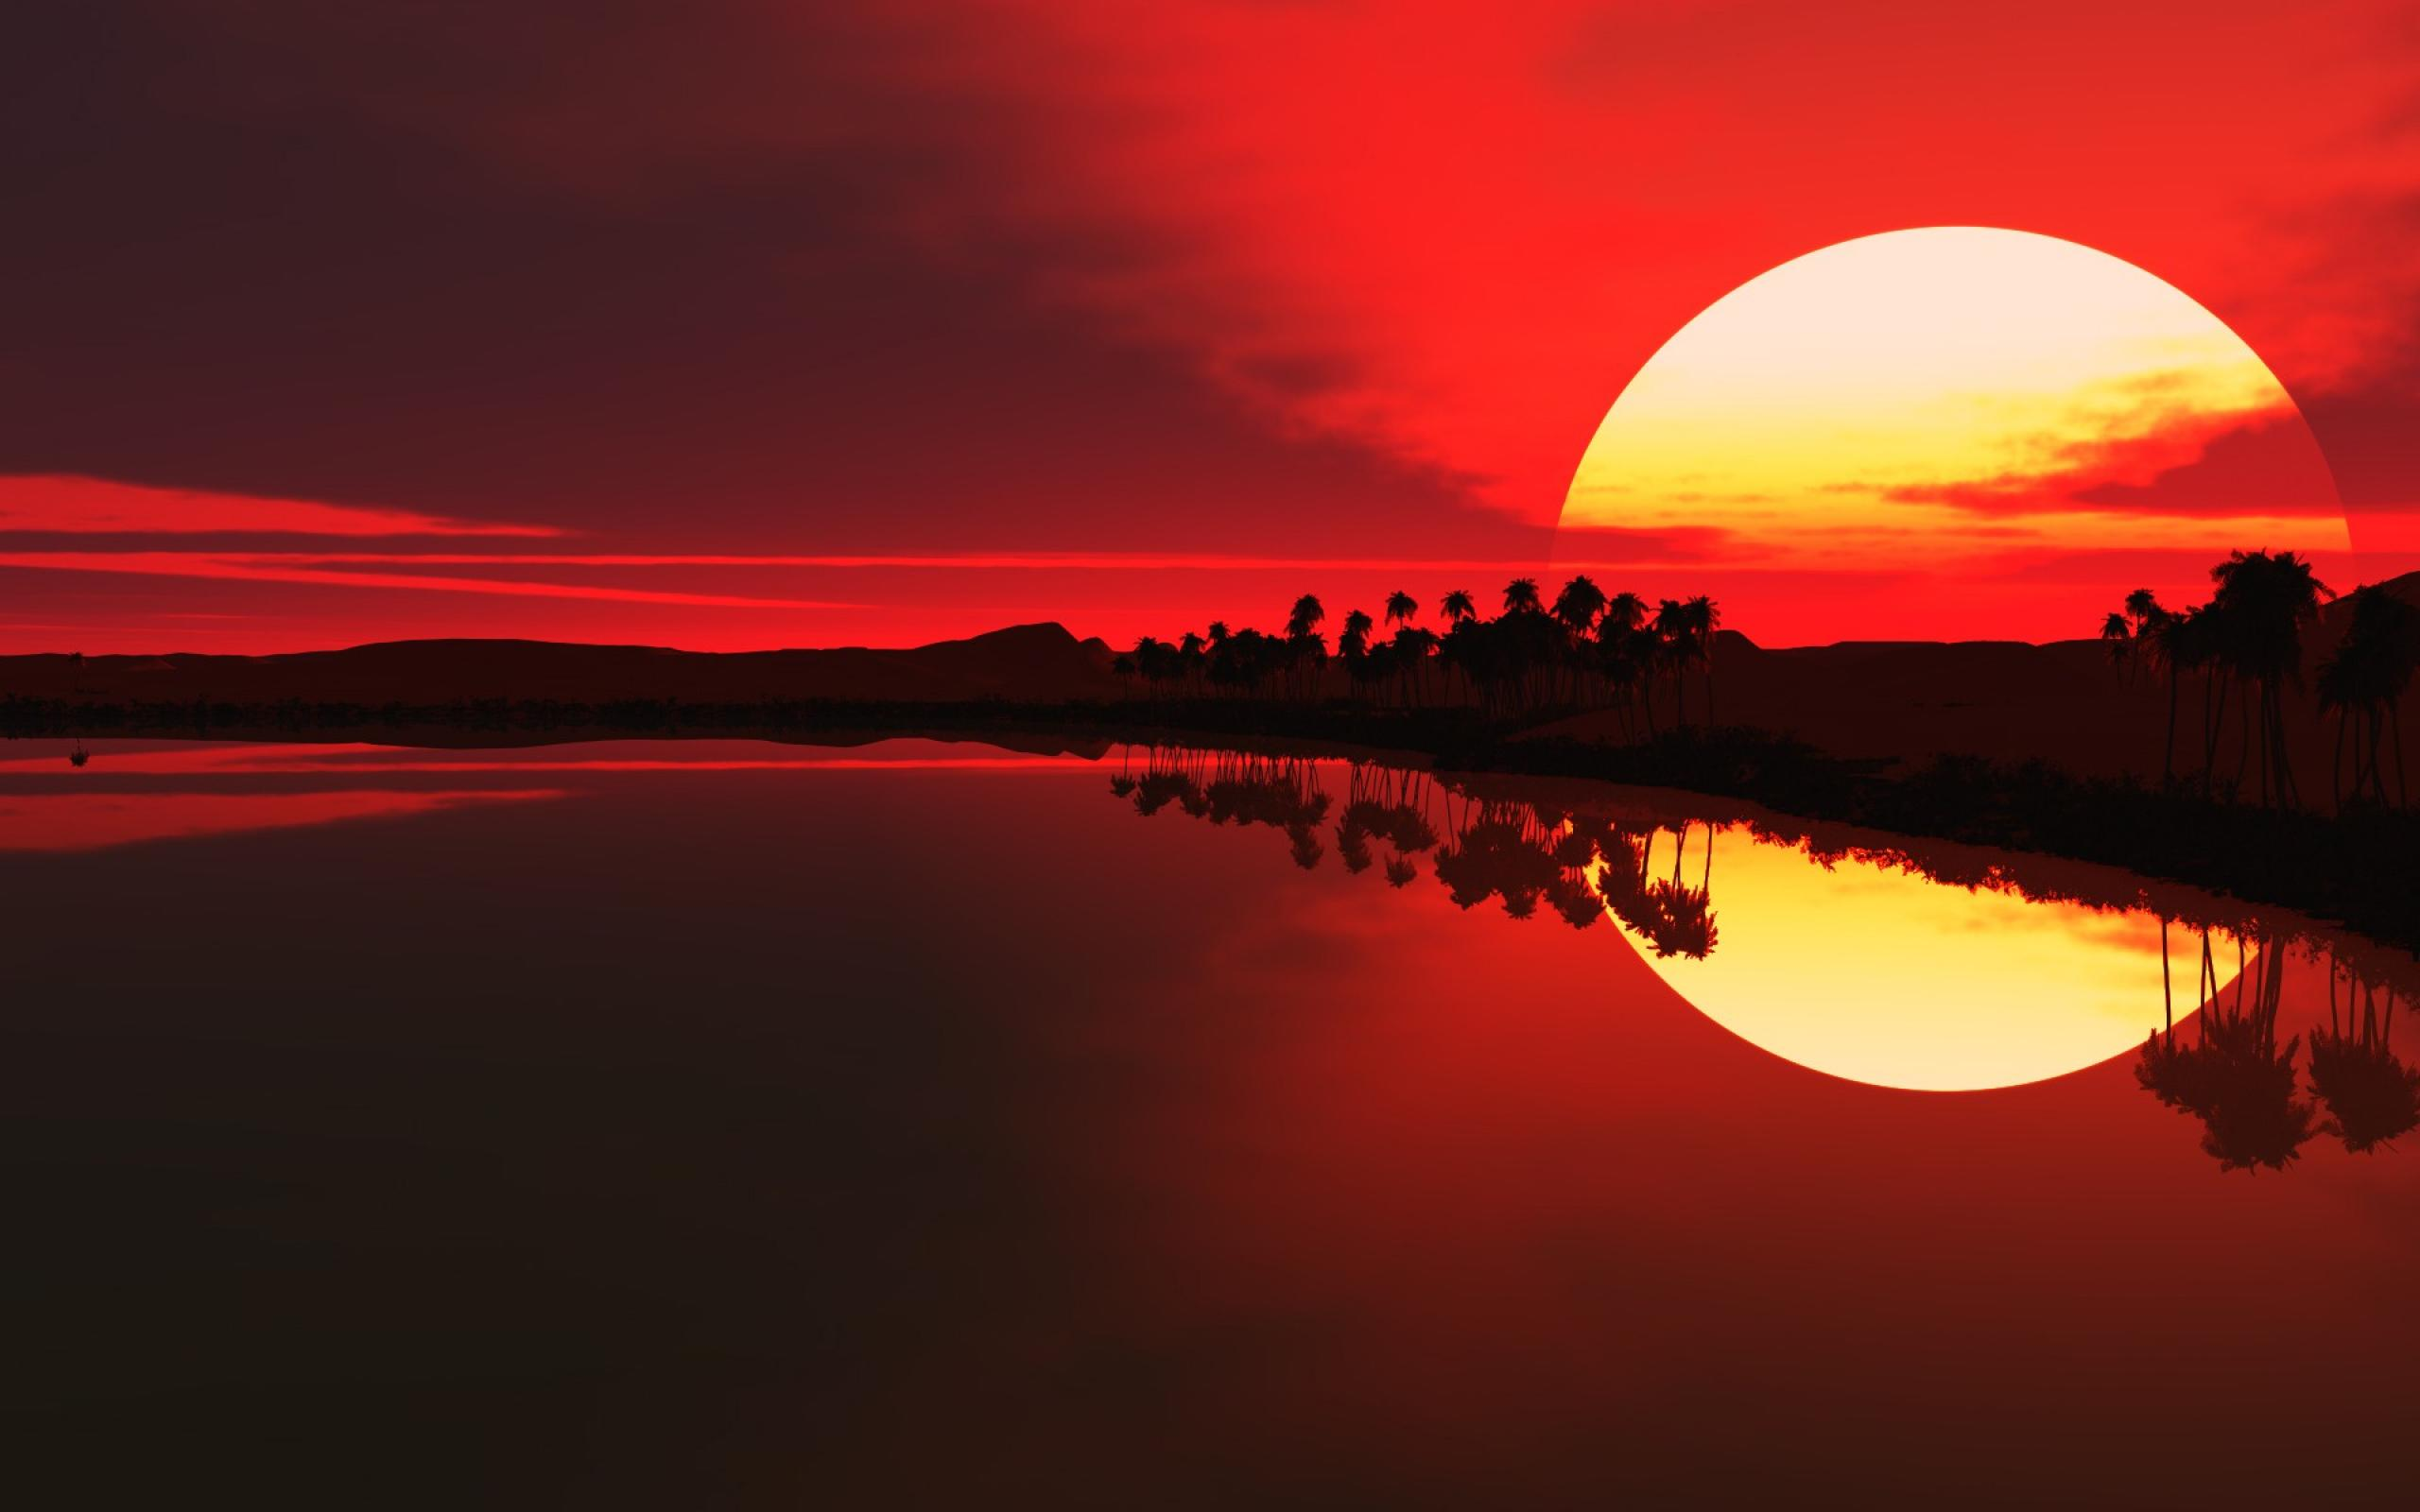 Beautiful Red Sunset Over Lake Desktop Wallpaper